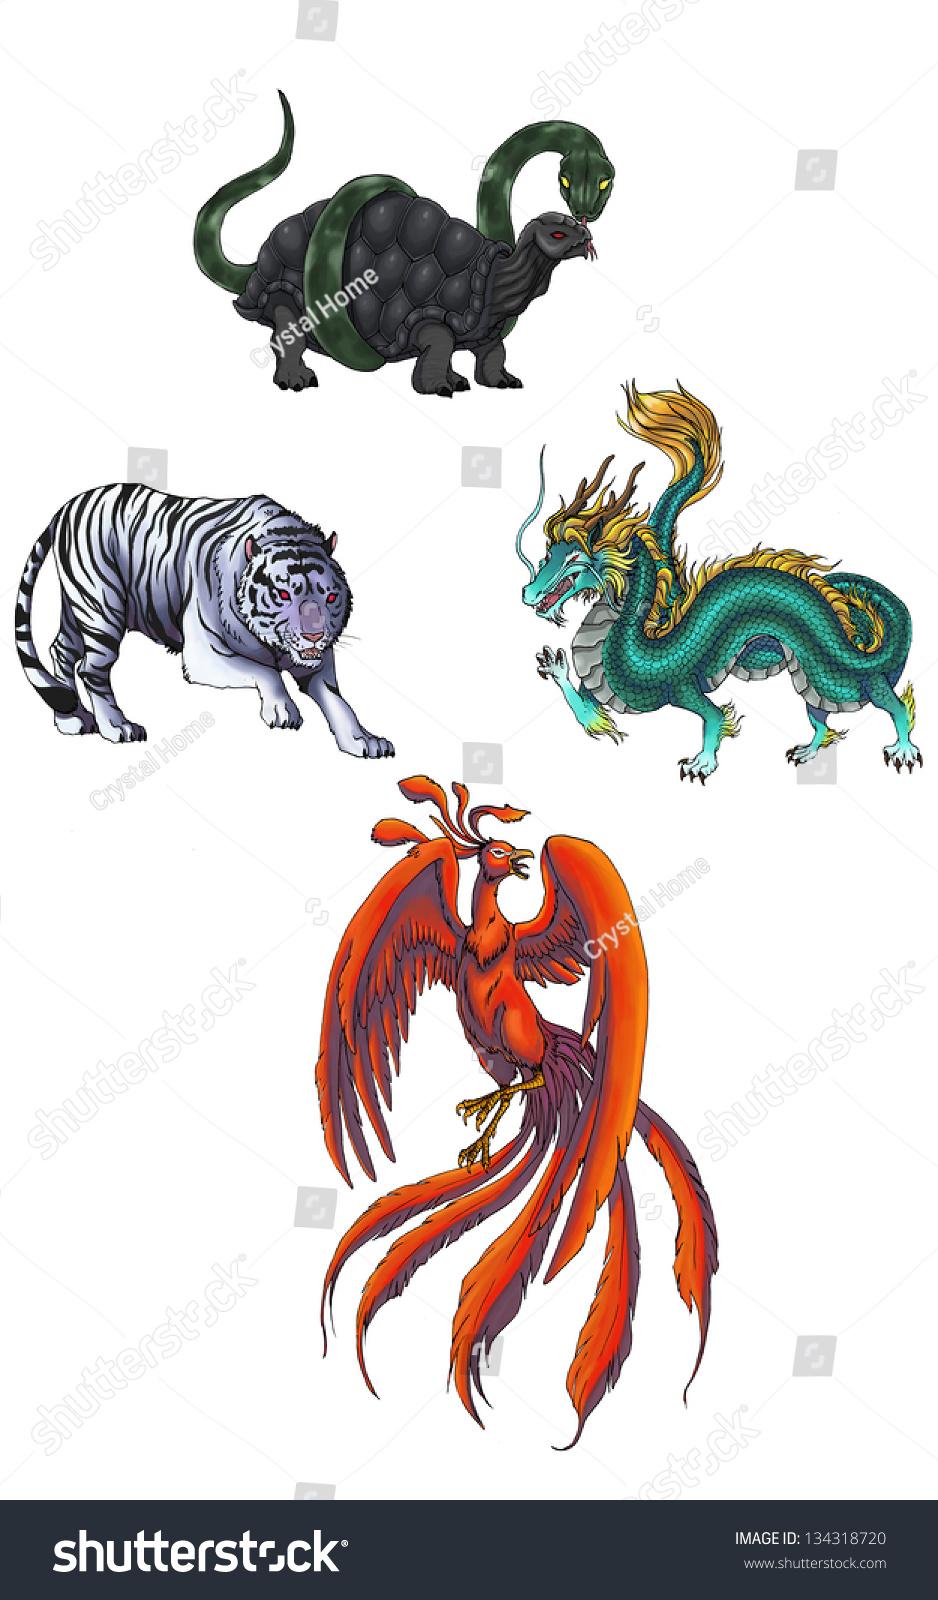 Illustration 4 Chinese Mythical Religious Monster Stock Illustration